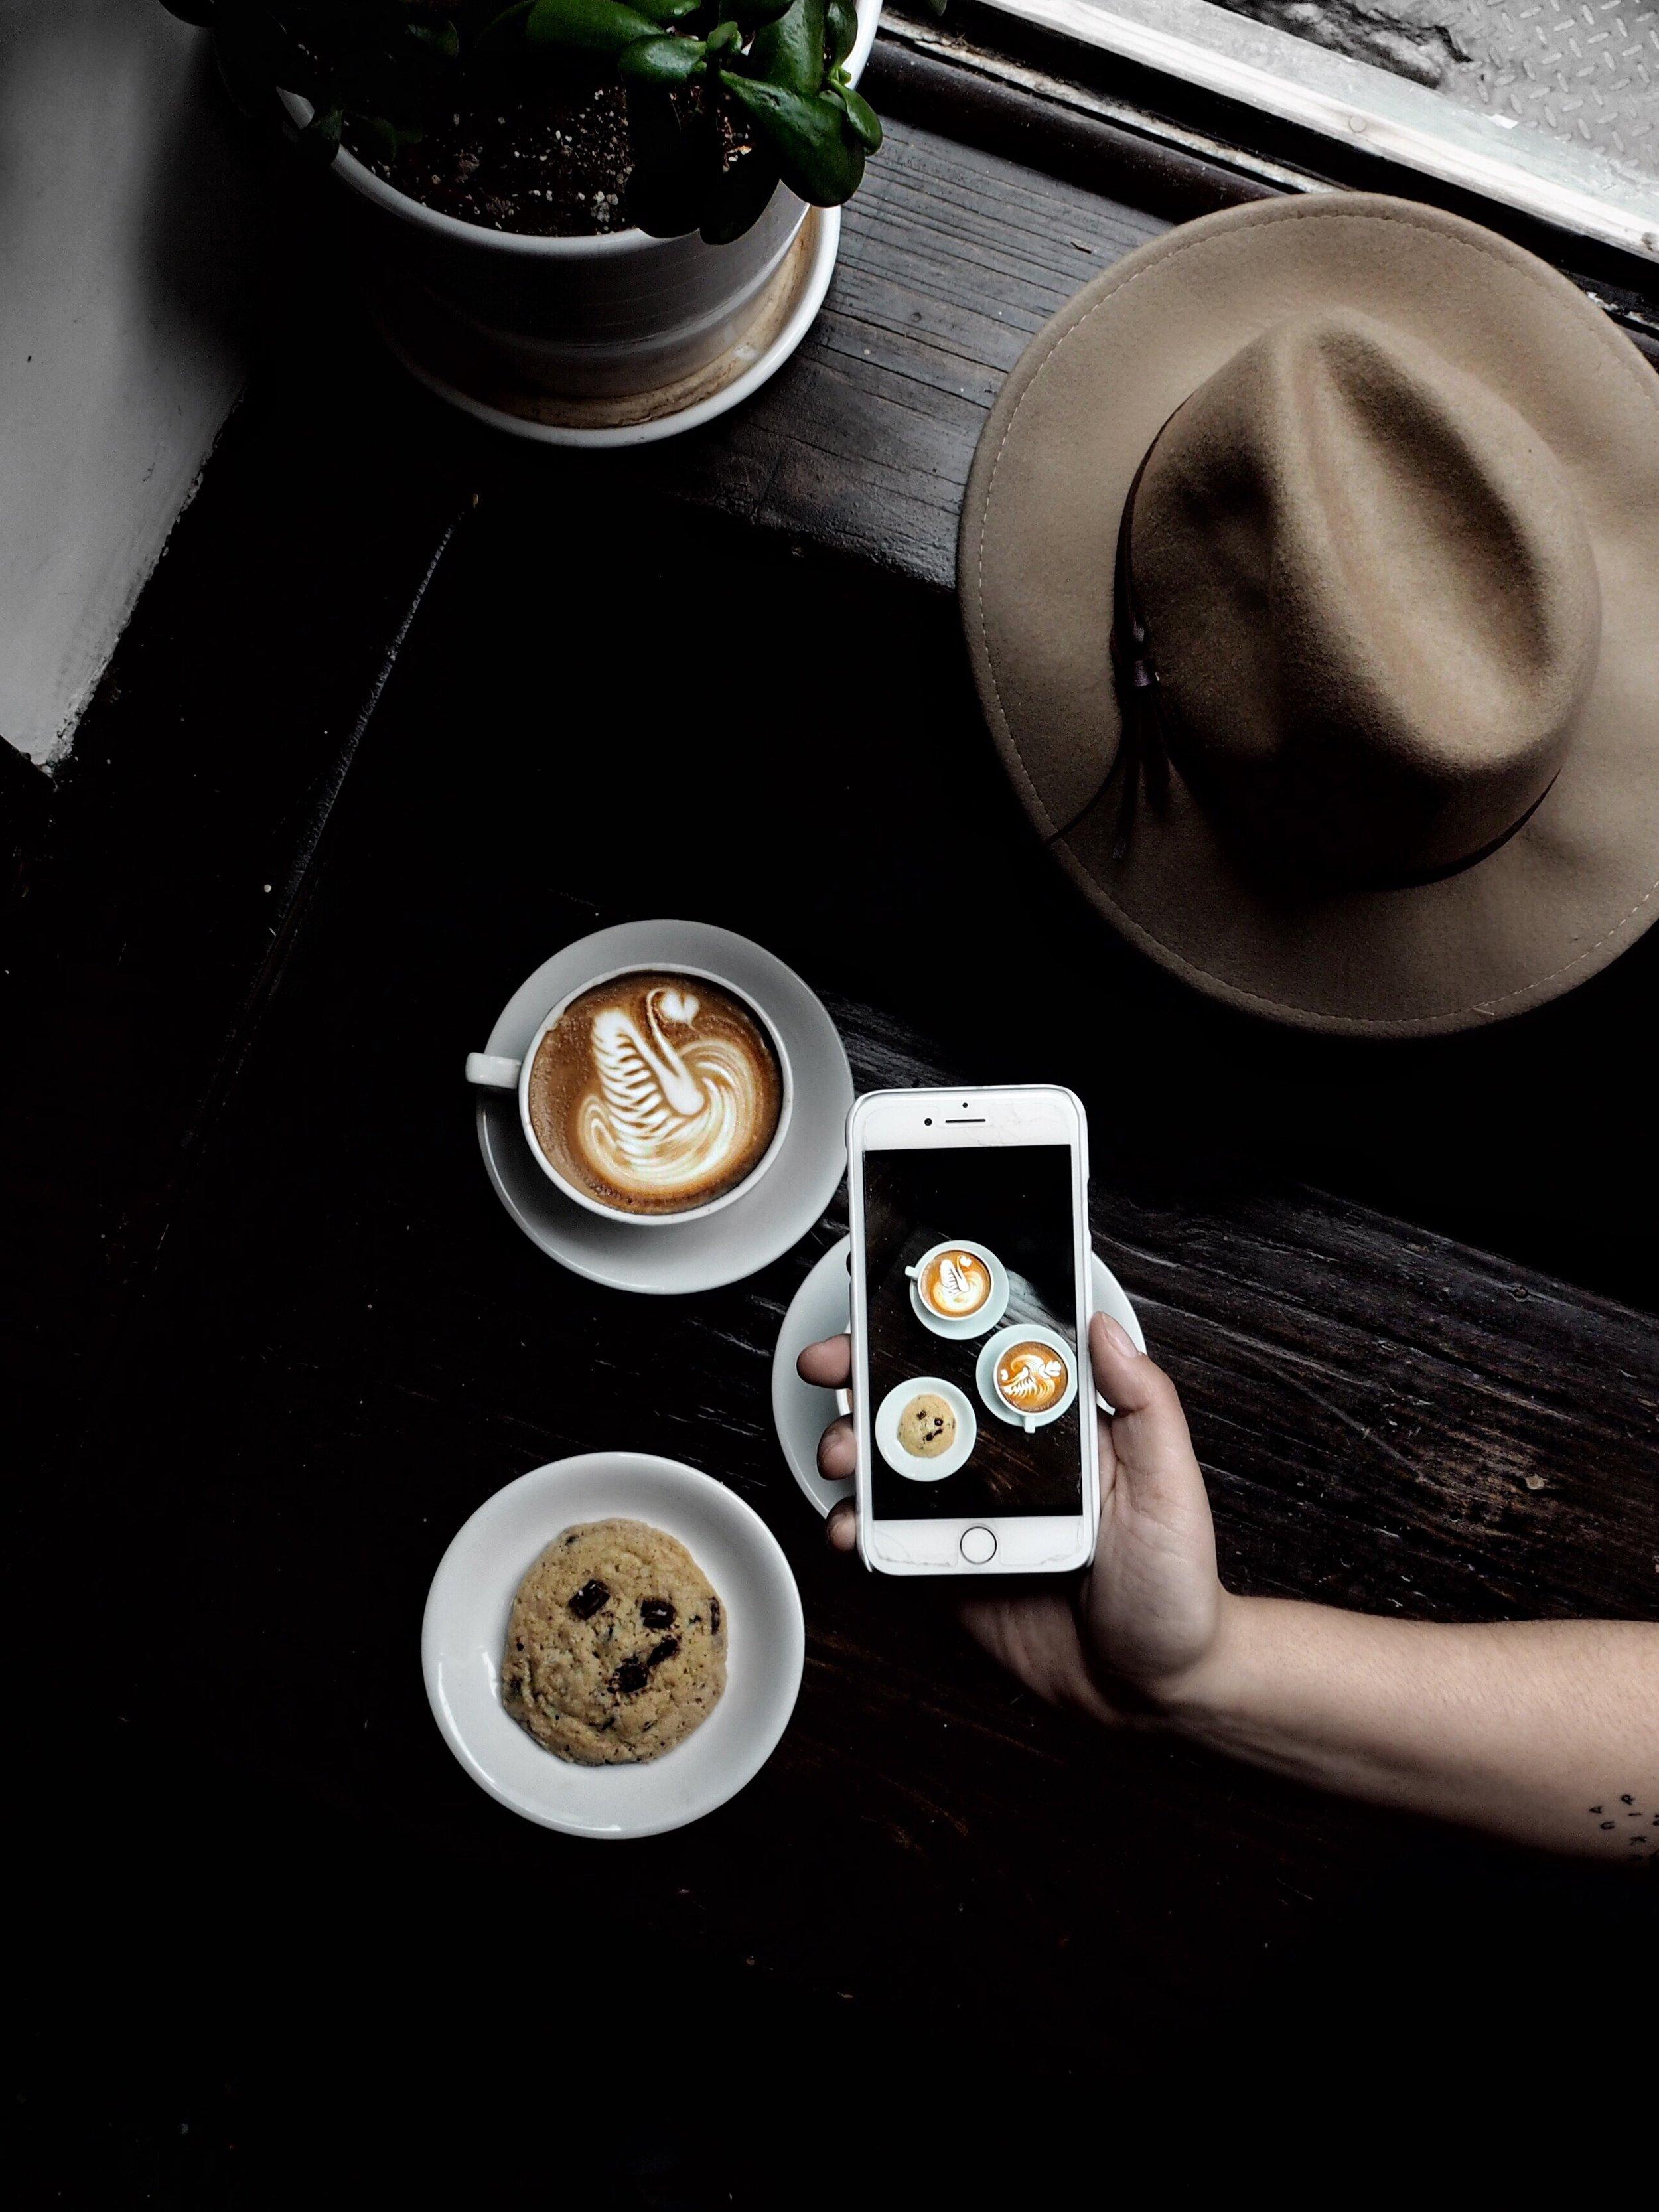 ludlow-coffee-supply-newyork